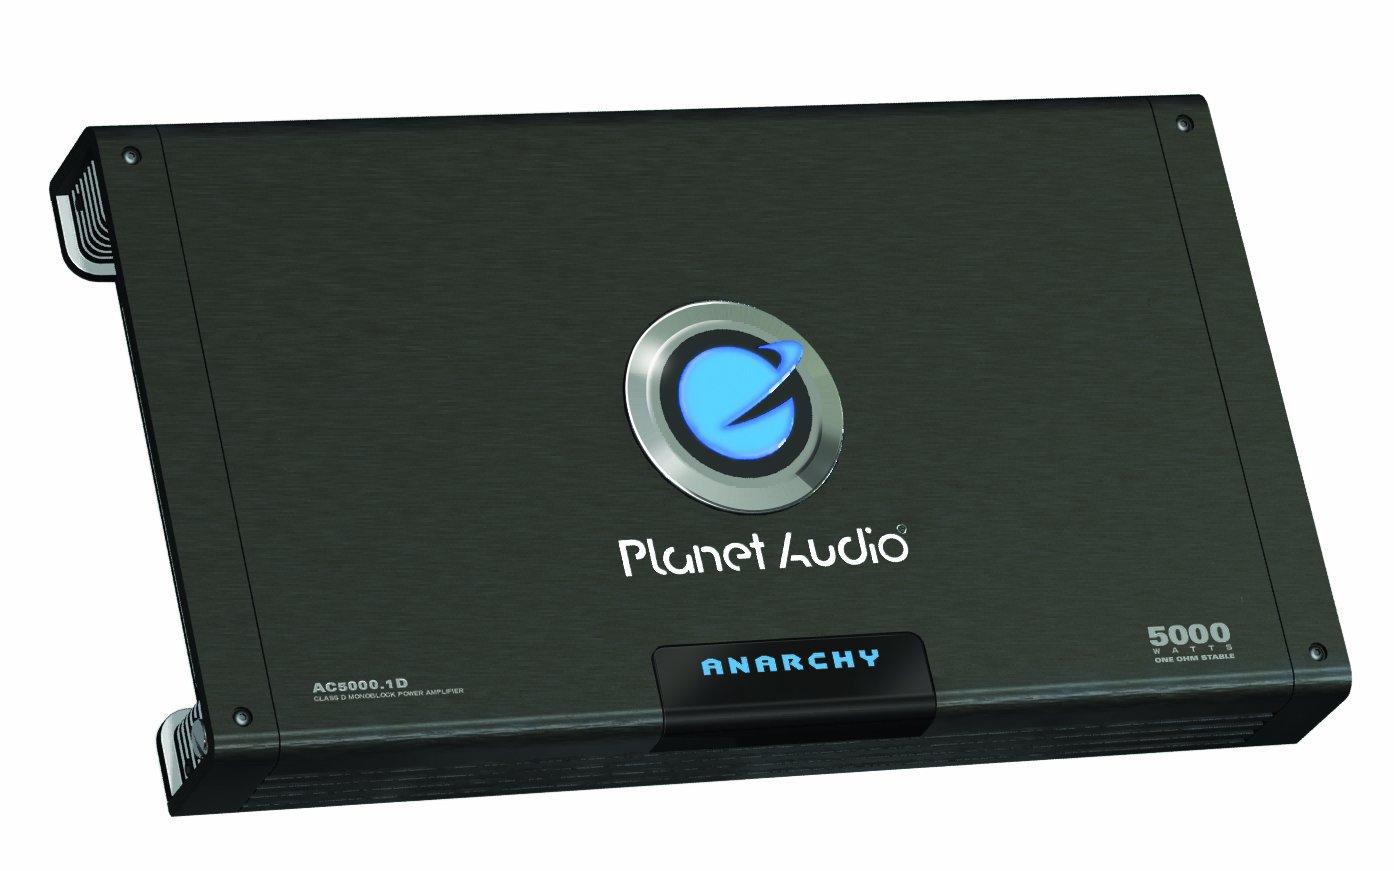 Planet Audio Ac5000.1D Anarchy 5000-Watt Monoblock Class D 1 To 8 Ohm Stable .. 8